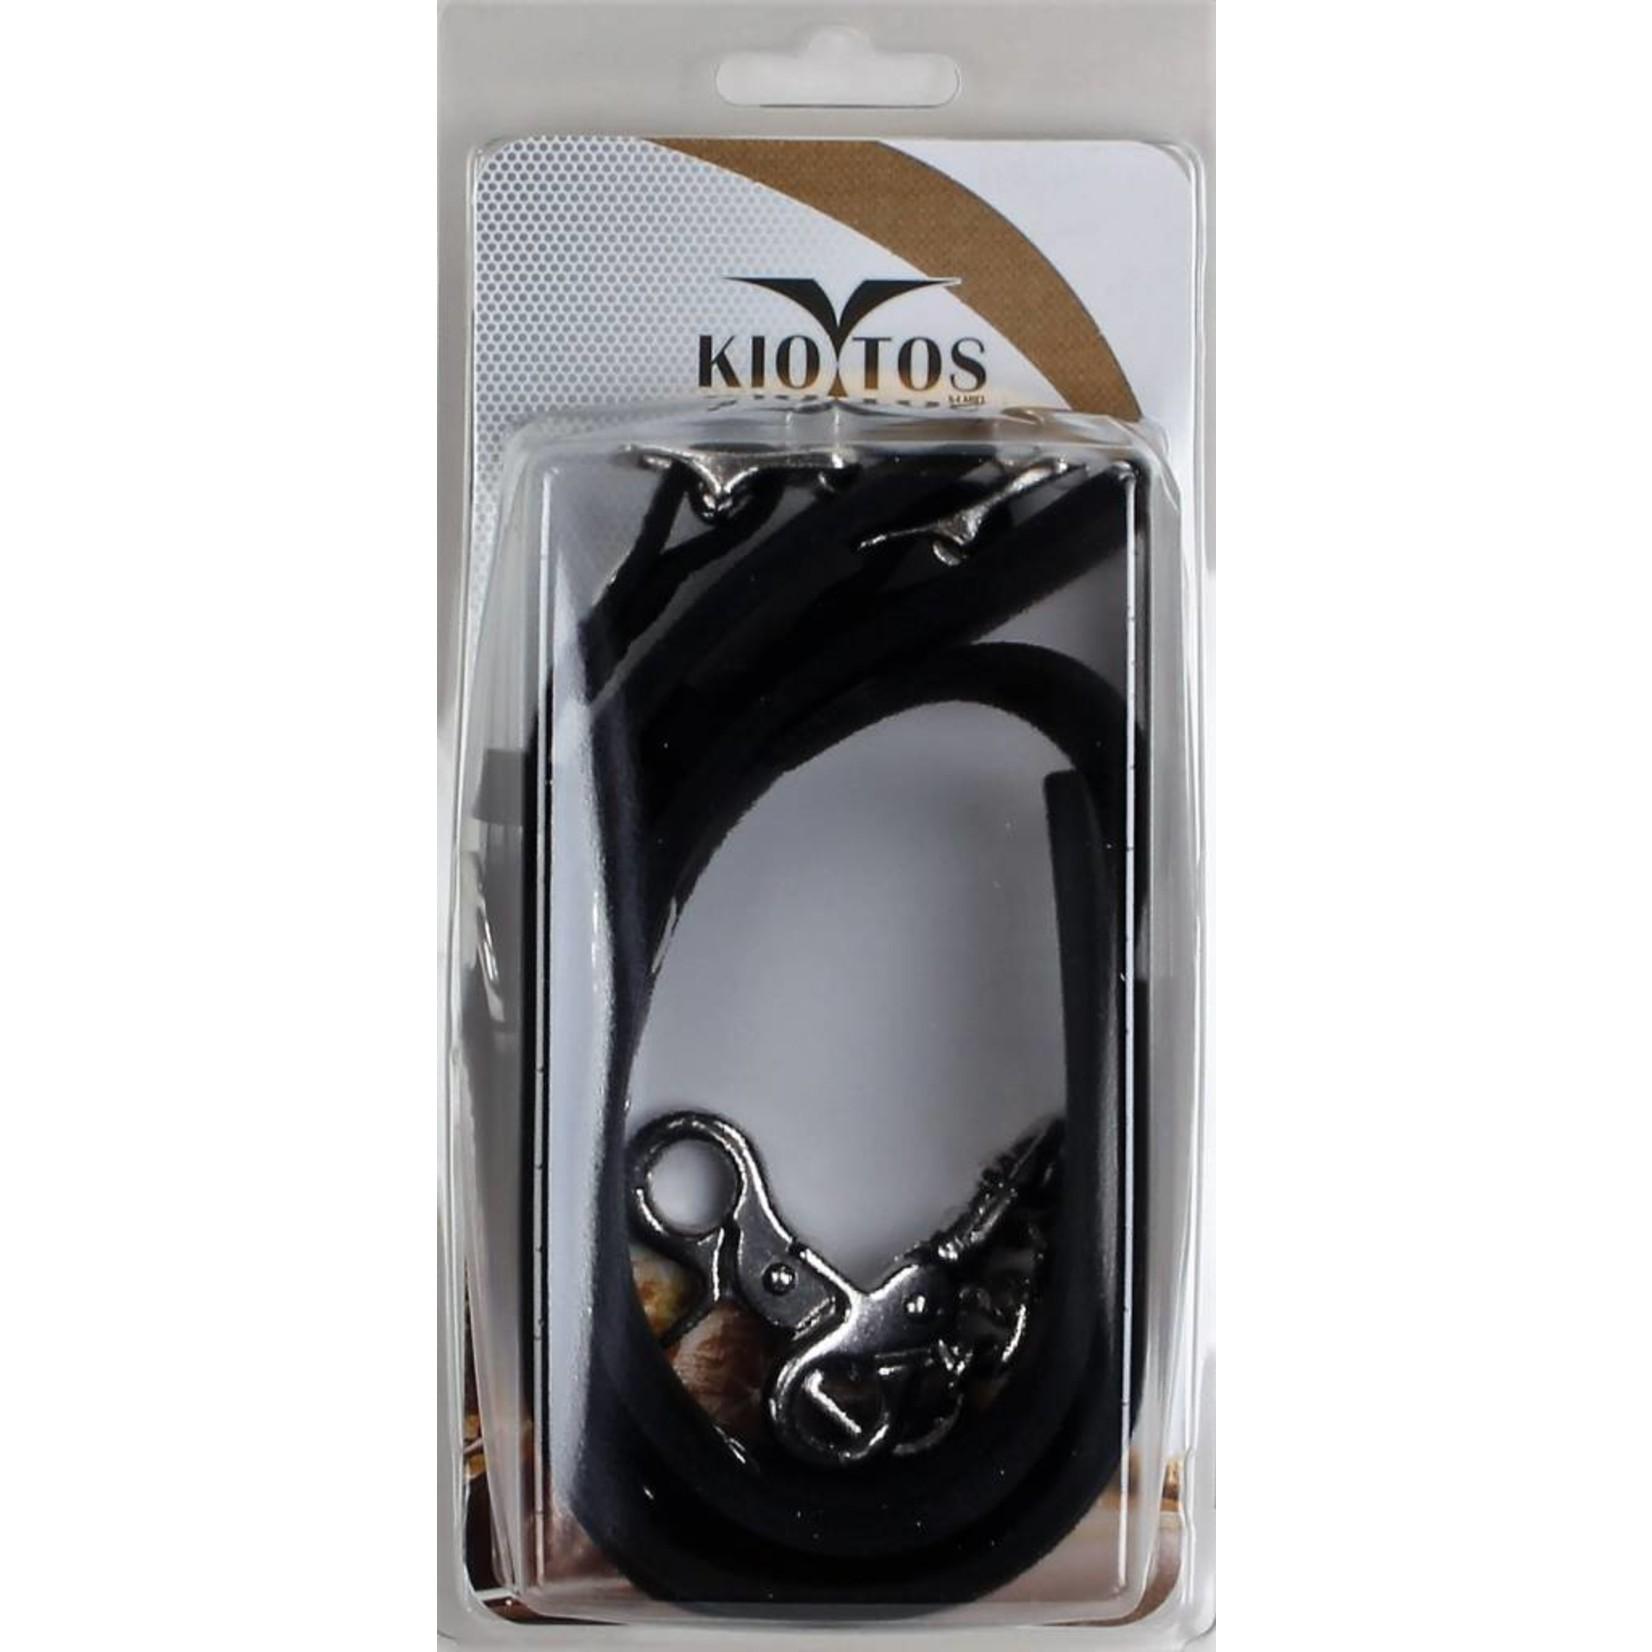 KIOTOS X Deluxe AnkleCuffs